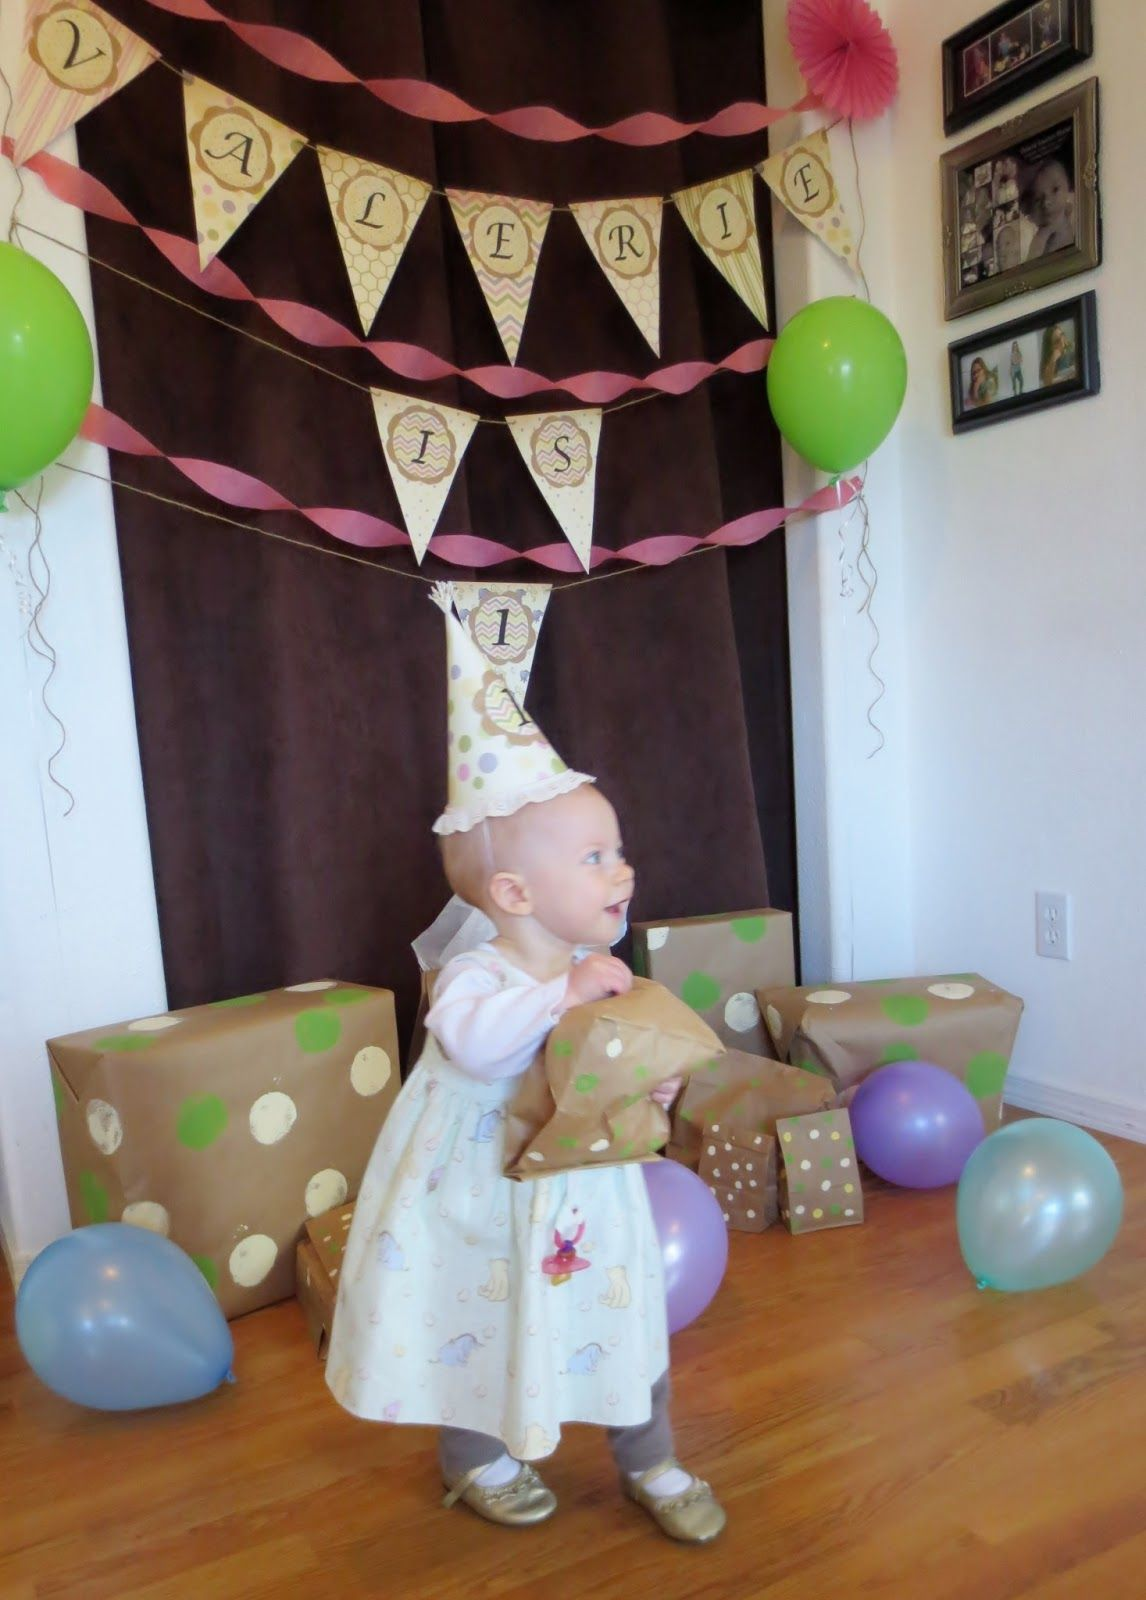 DIY Vintage Party Decorations Classic Winnie The Pooh Brownie Goose Tilly Anelegantartist